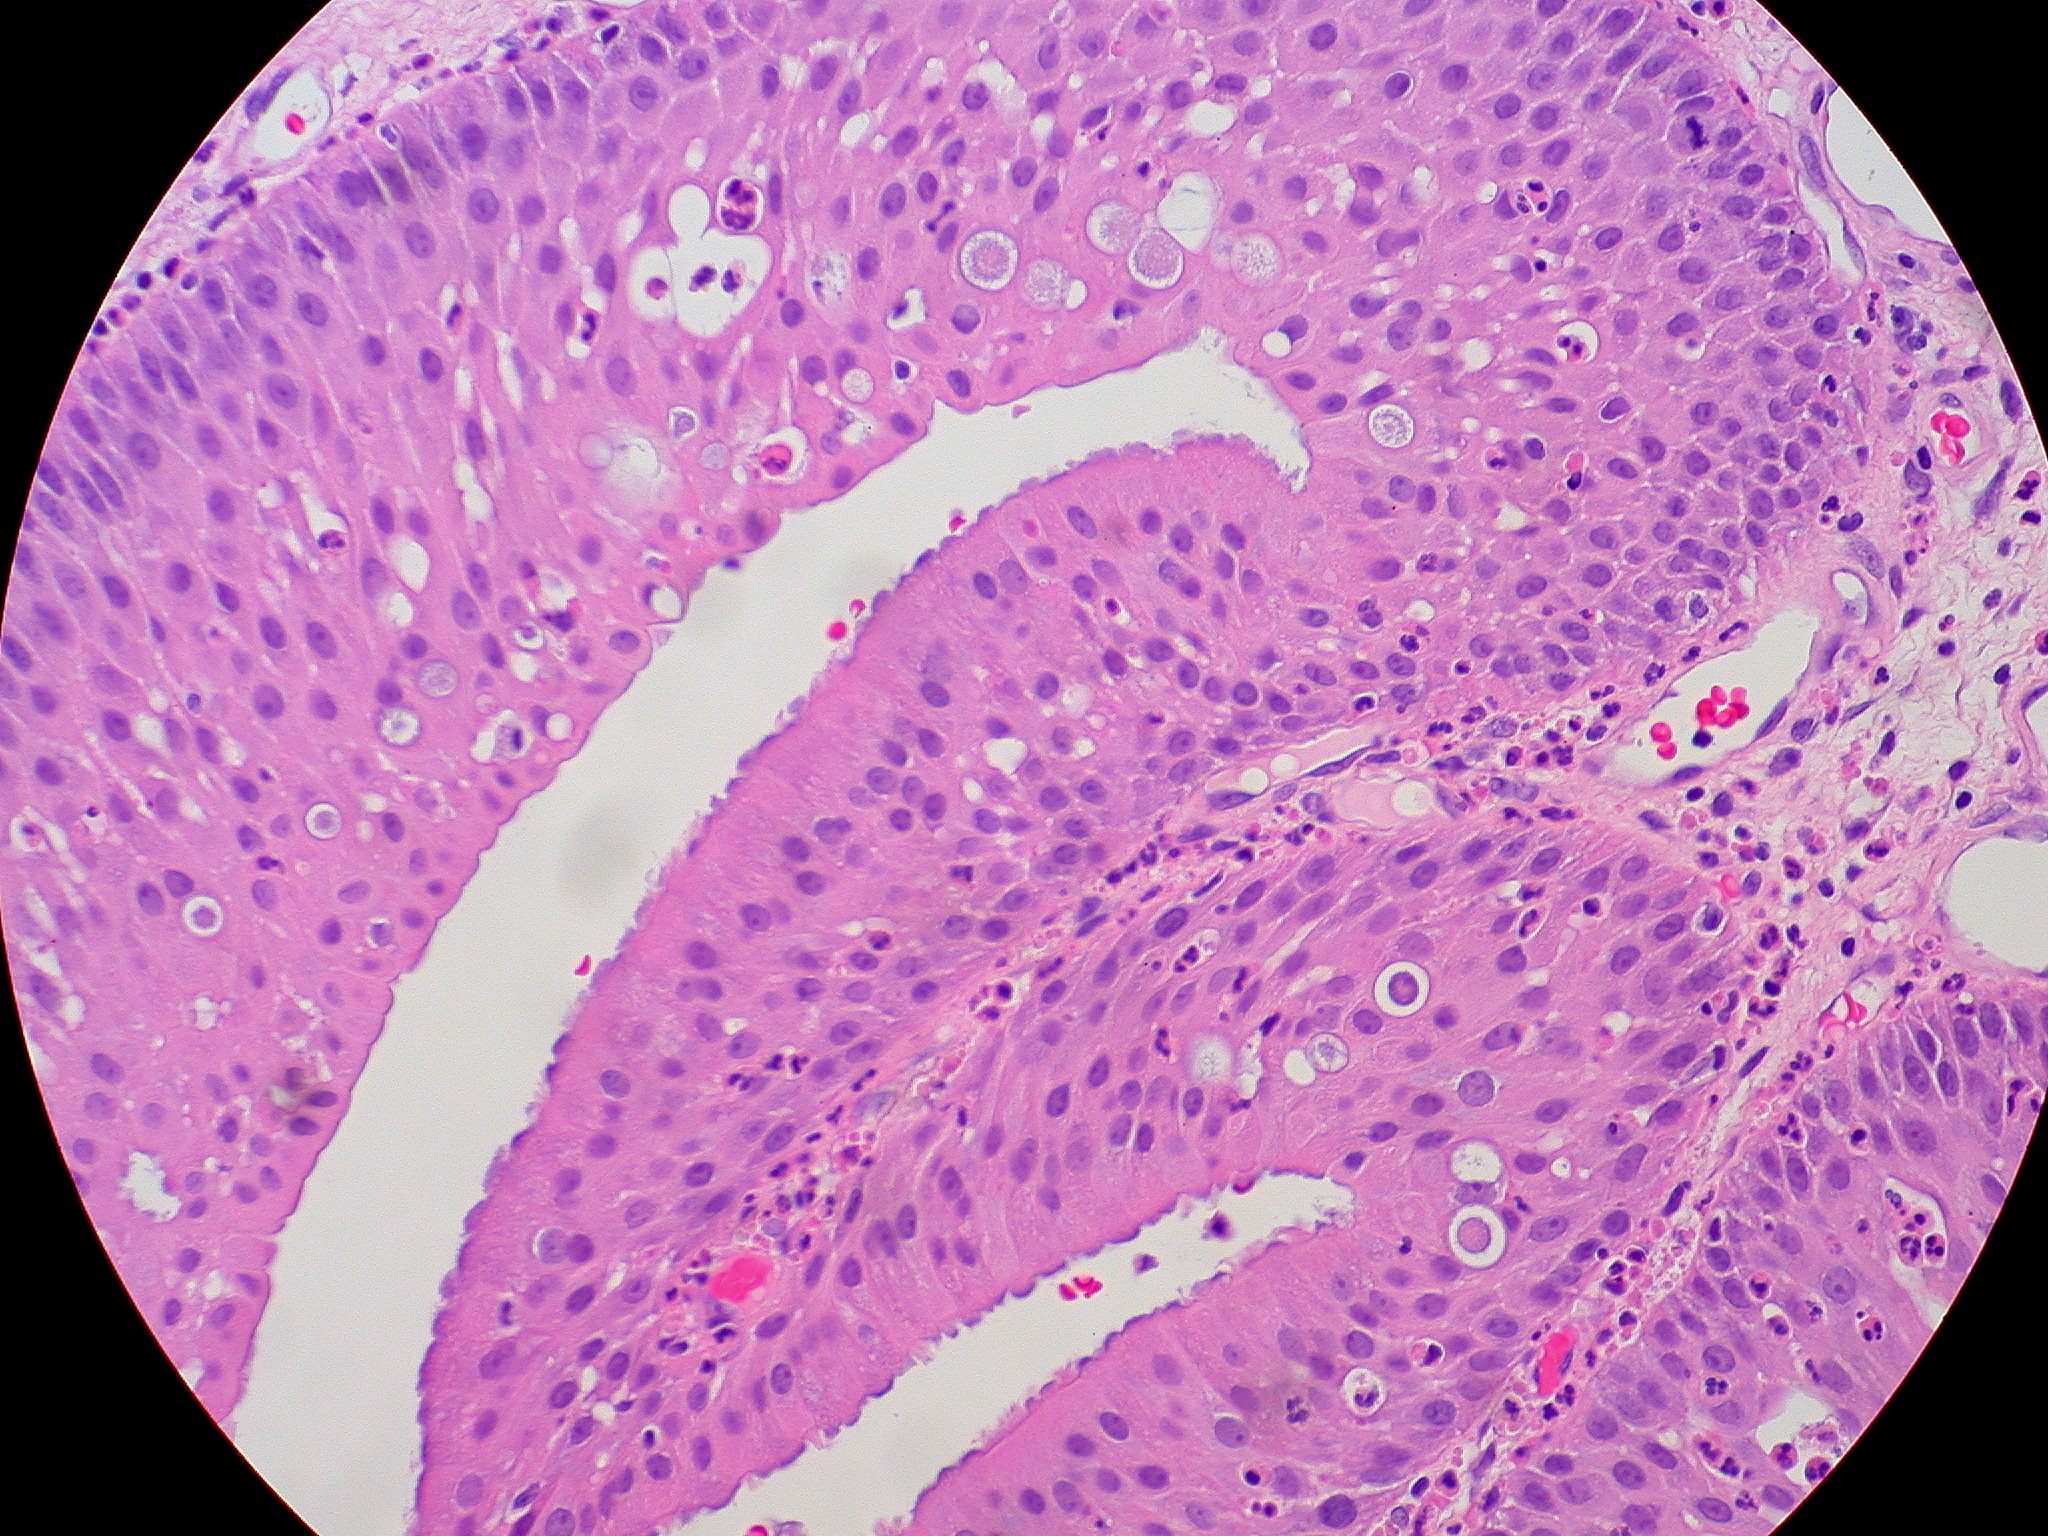 Nasal papilloma mri. Papilloma on nasal septum